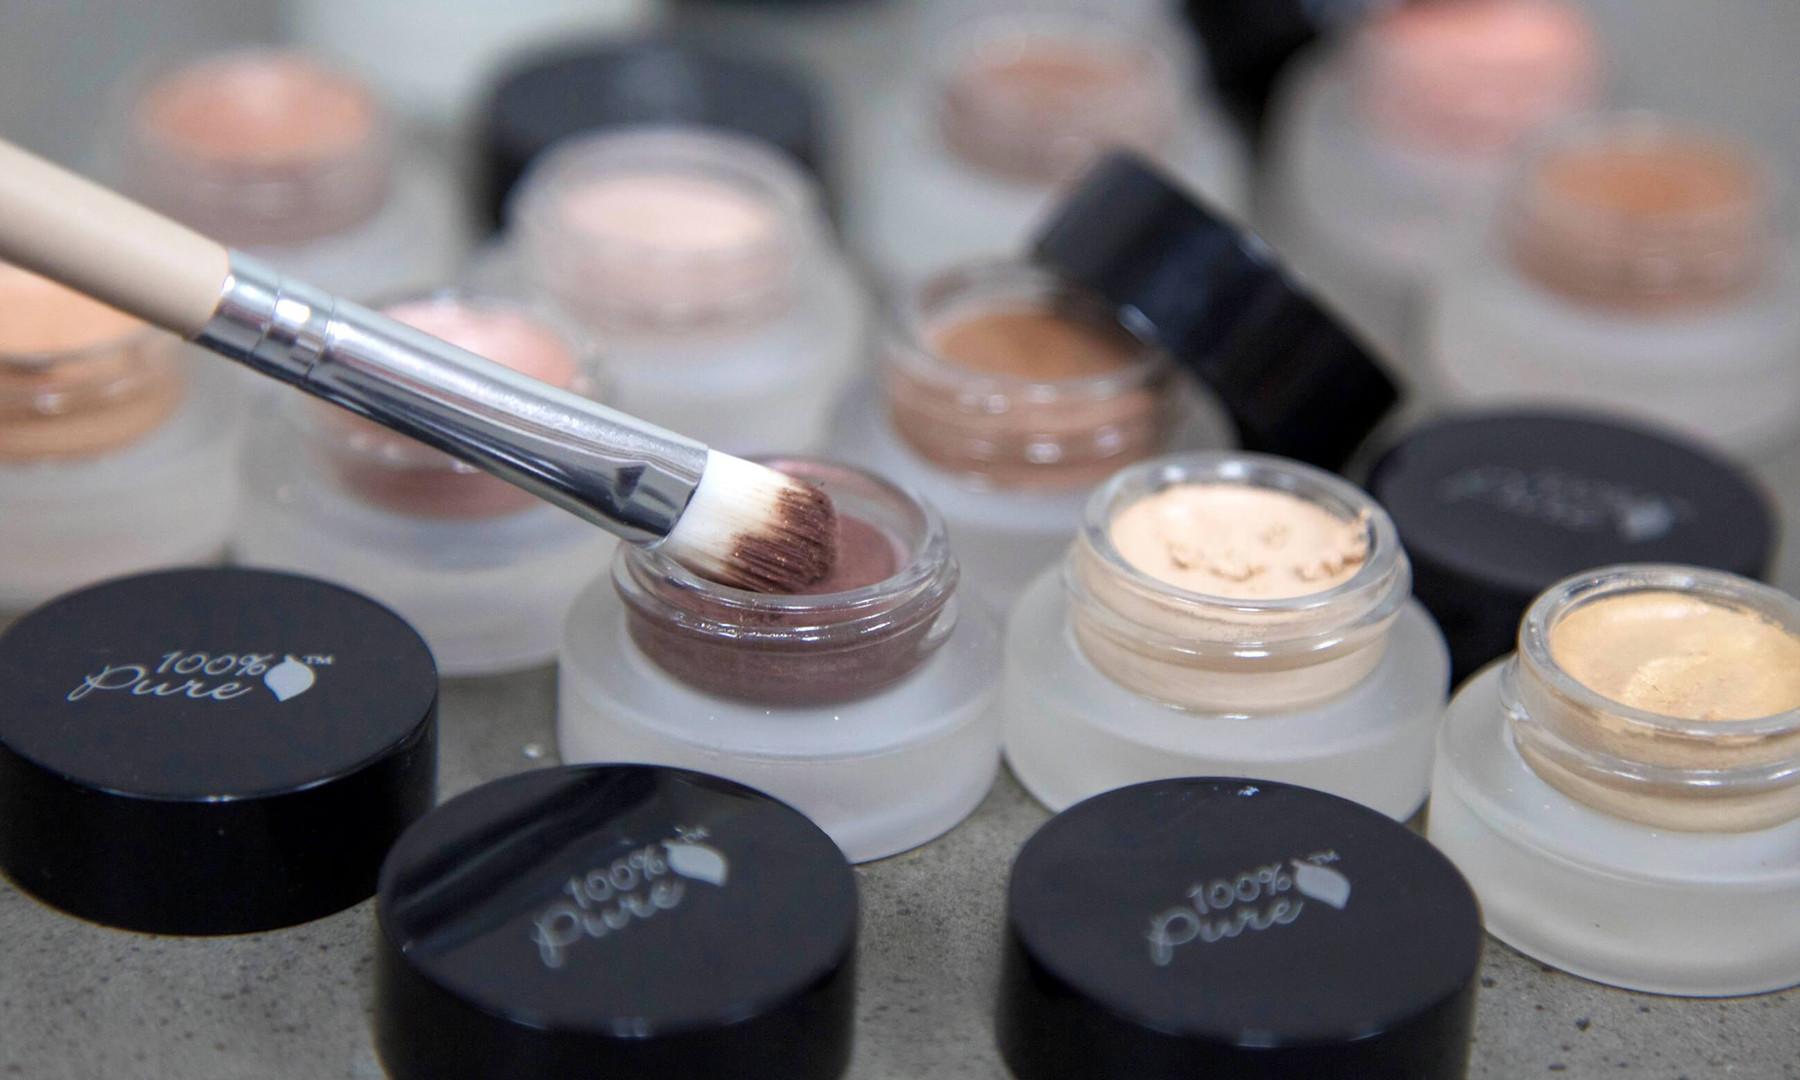 Guide to Eyeshadows